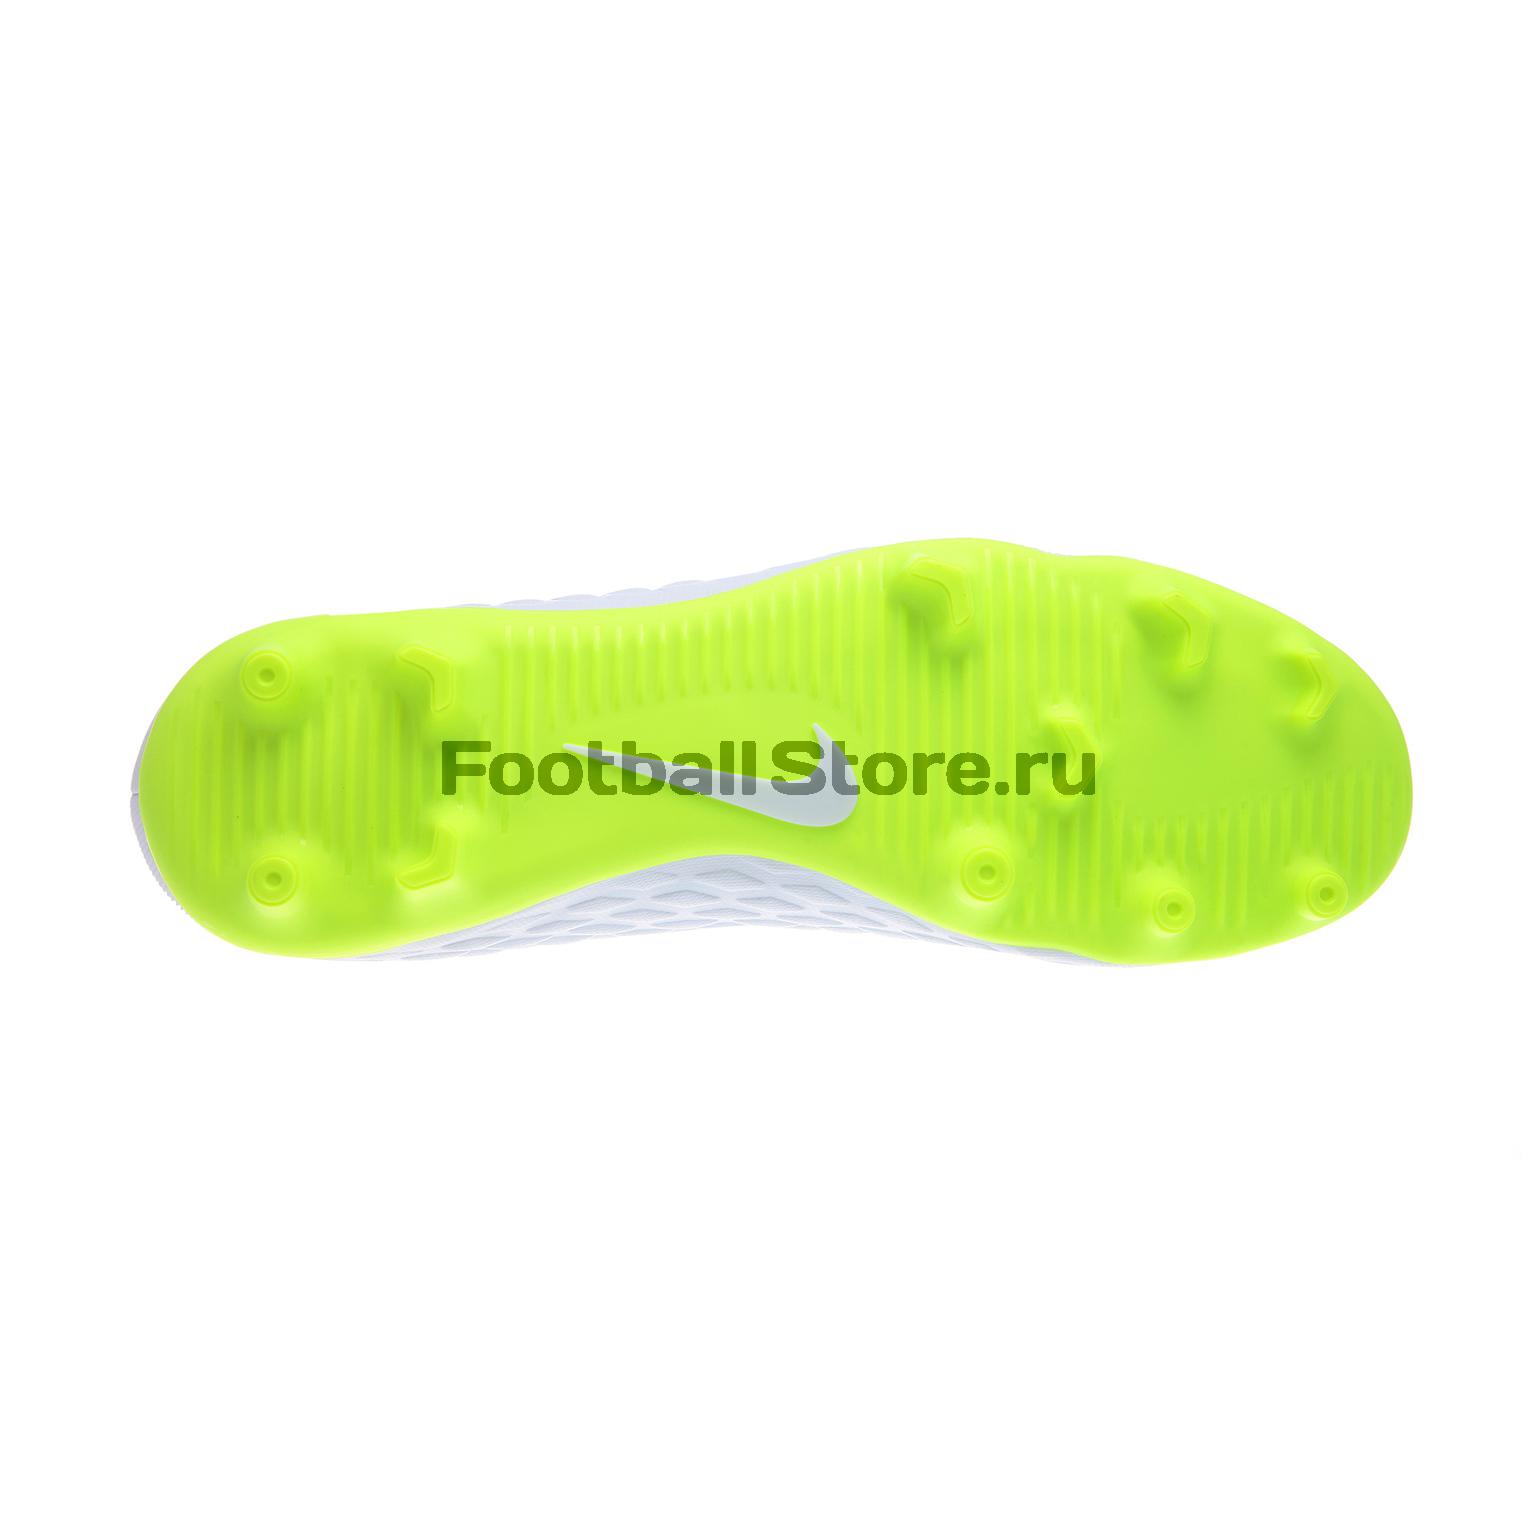 8ca9a8dff559 Бутсы Nike Hypervenom 3 Club FG AJ4145-107 – купить бутсы в интернет ...